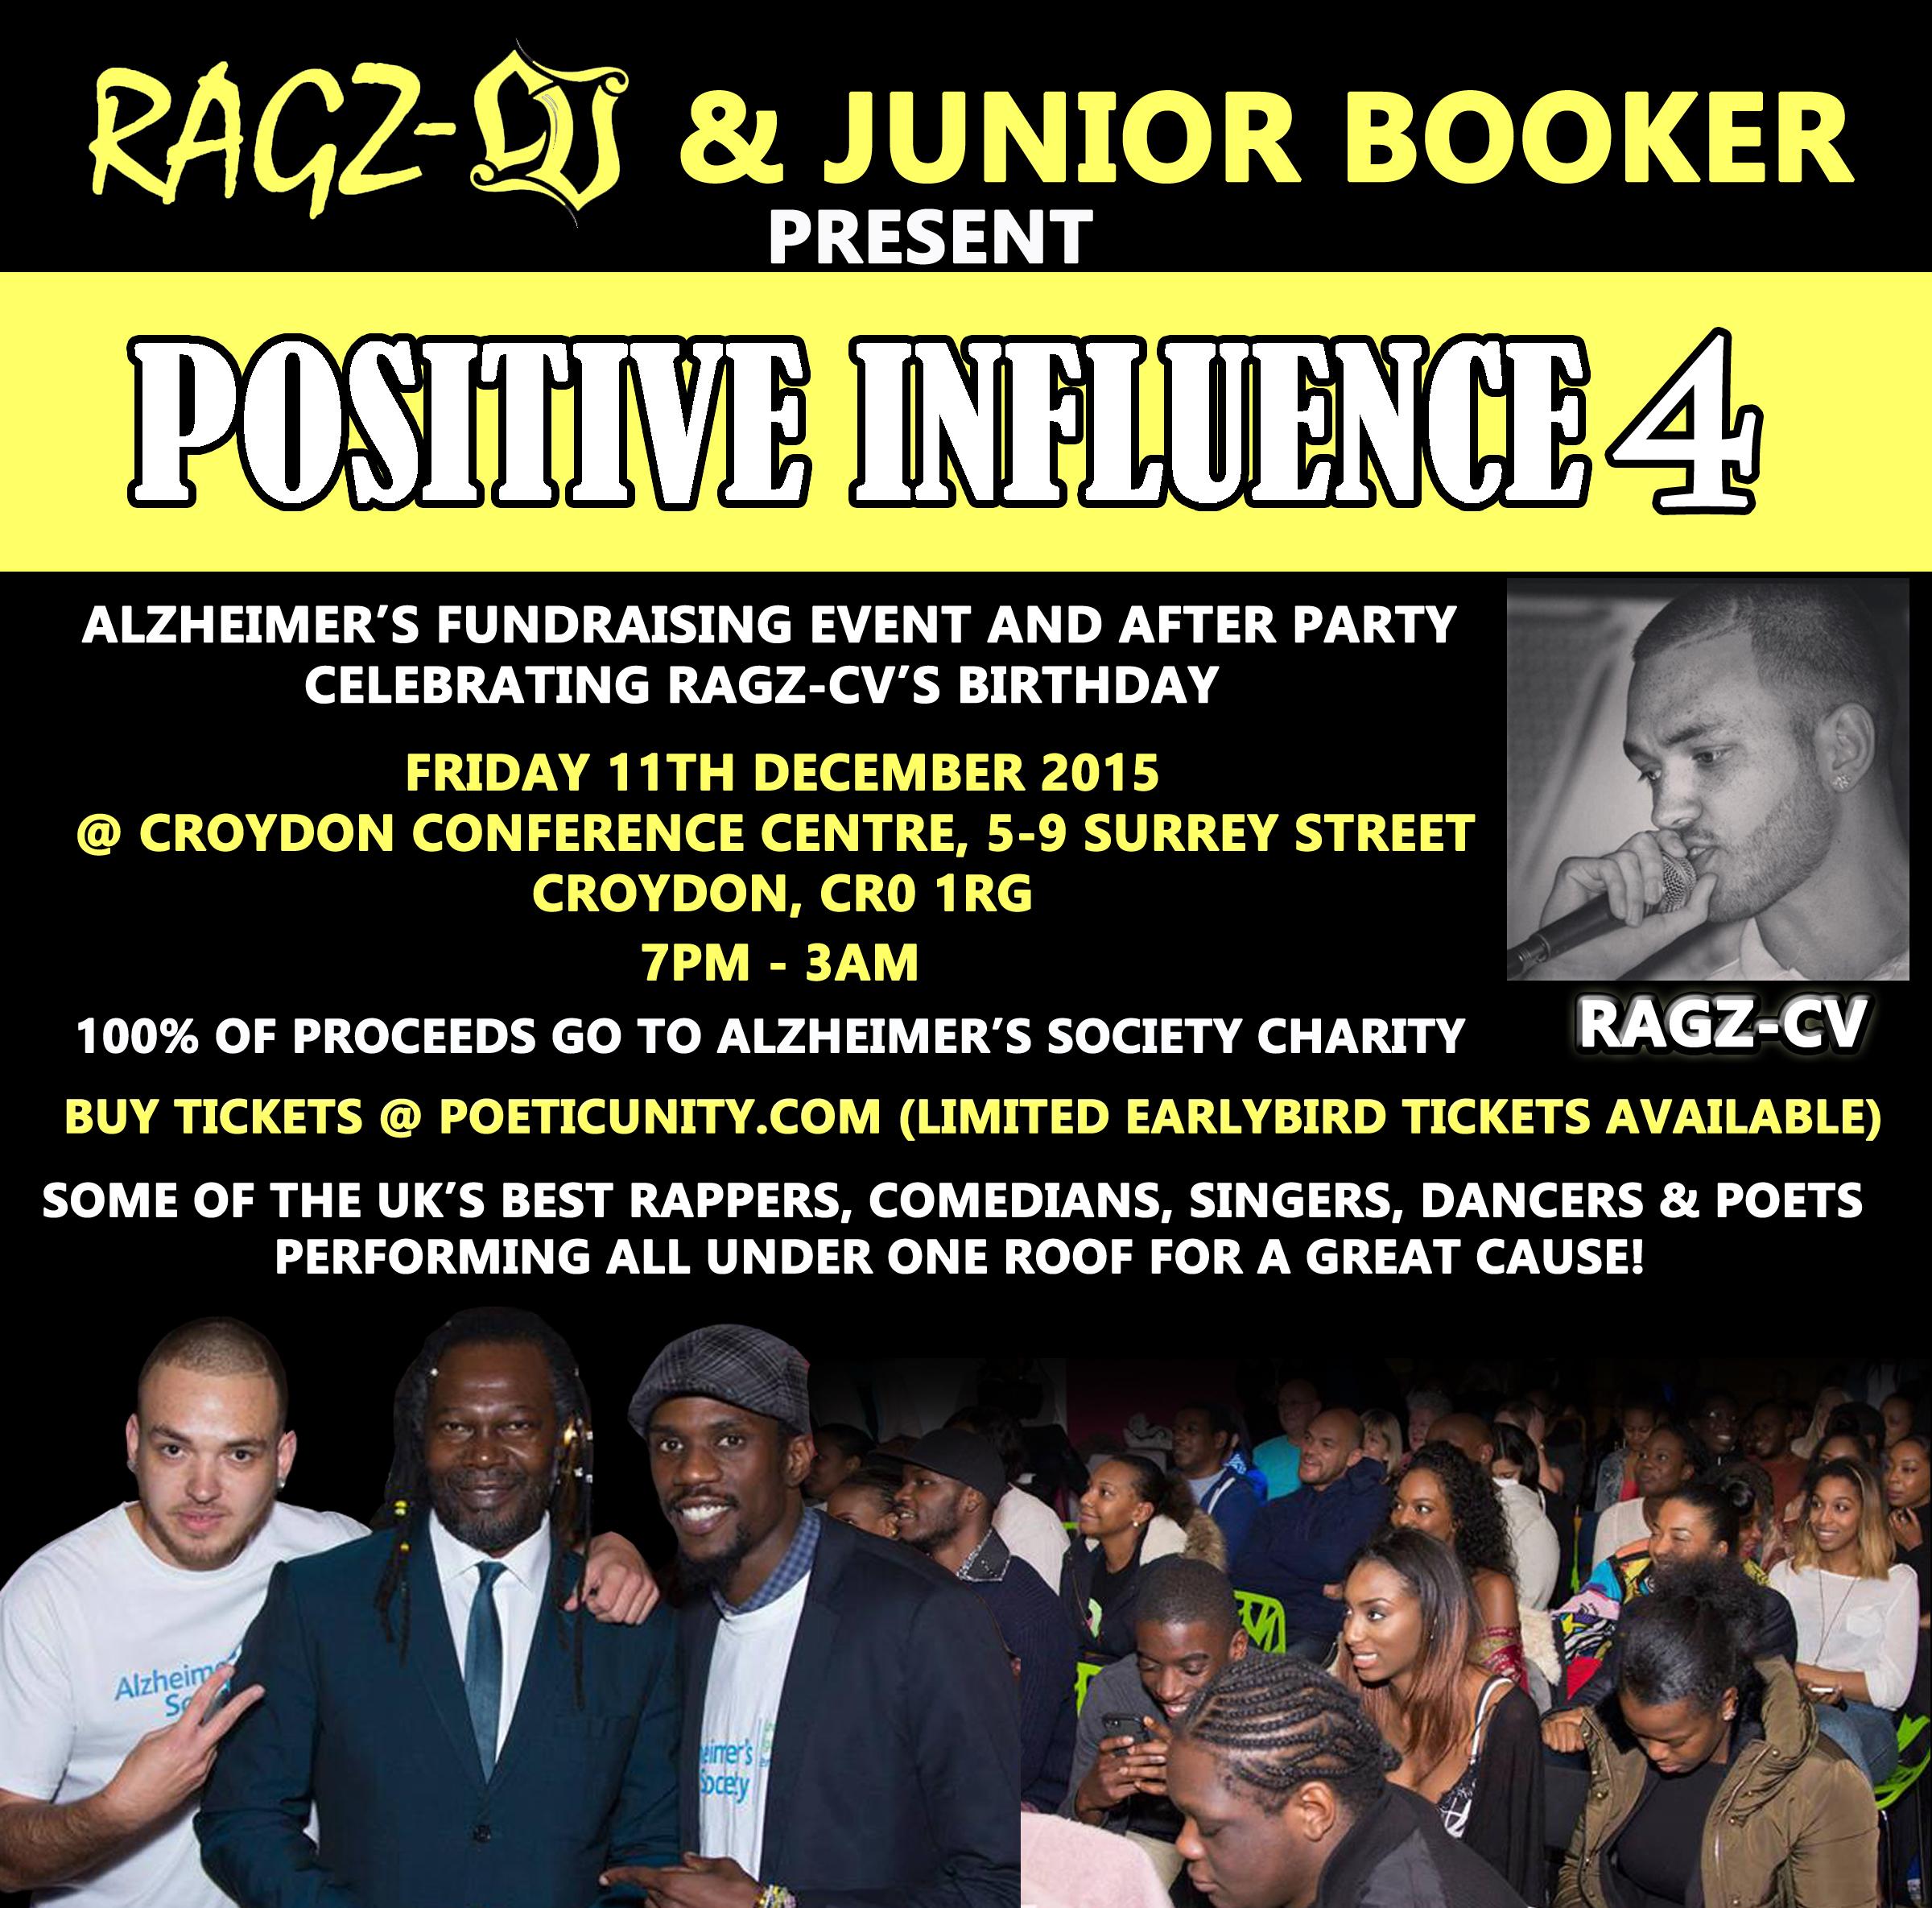 Positive Influence 4